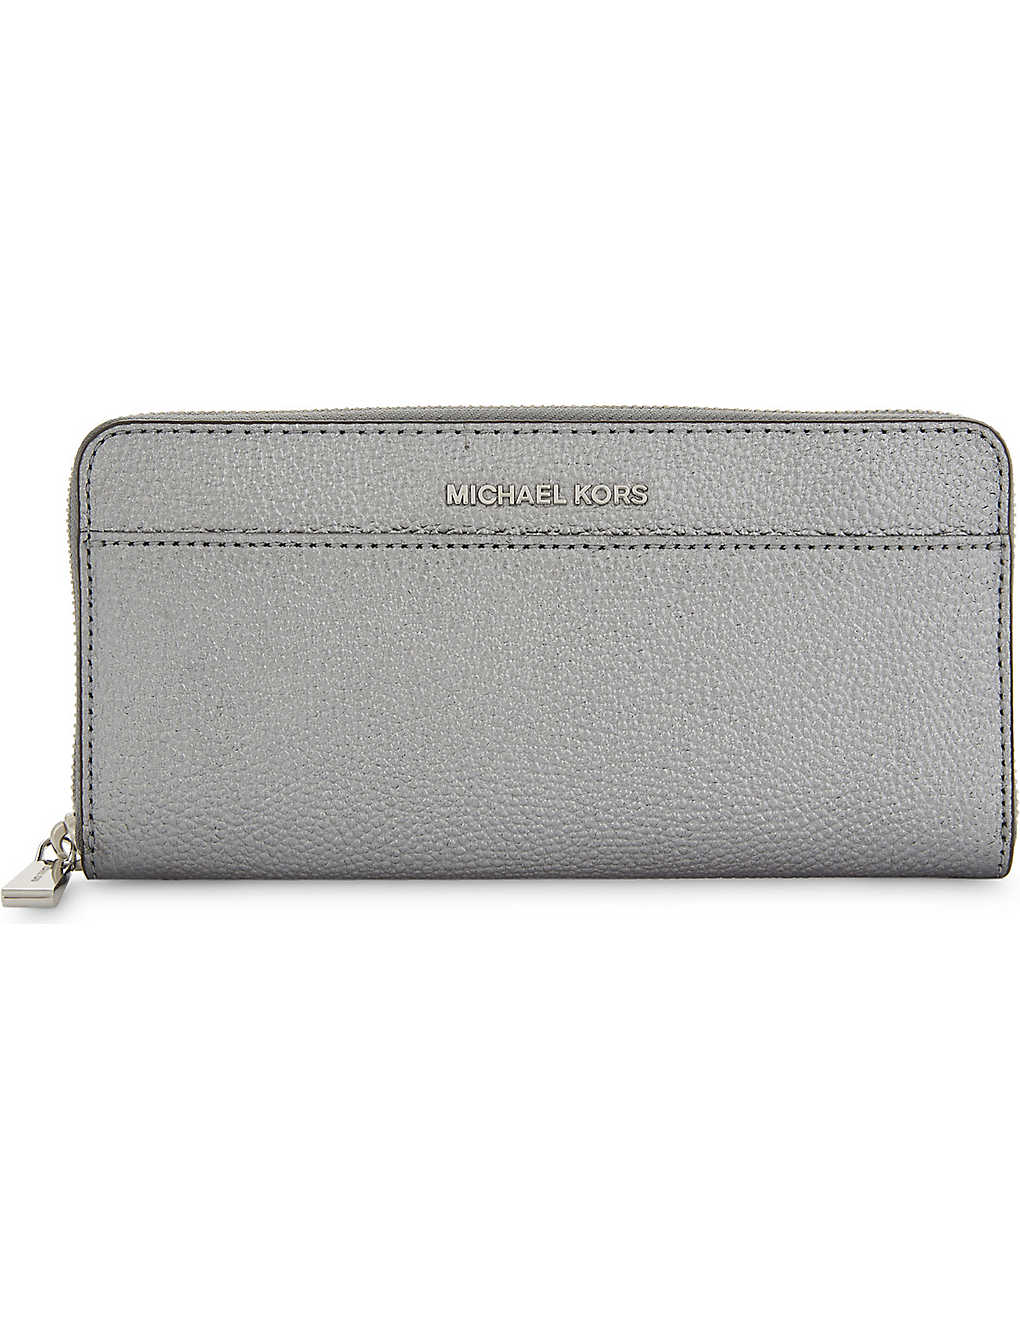 b99c66e41dc73d MICHAEL MICHAEL KORS - Mercer Continental metallic leather wallet ...